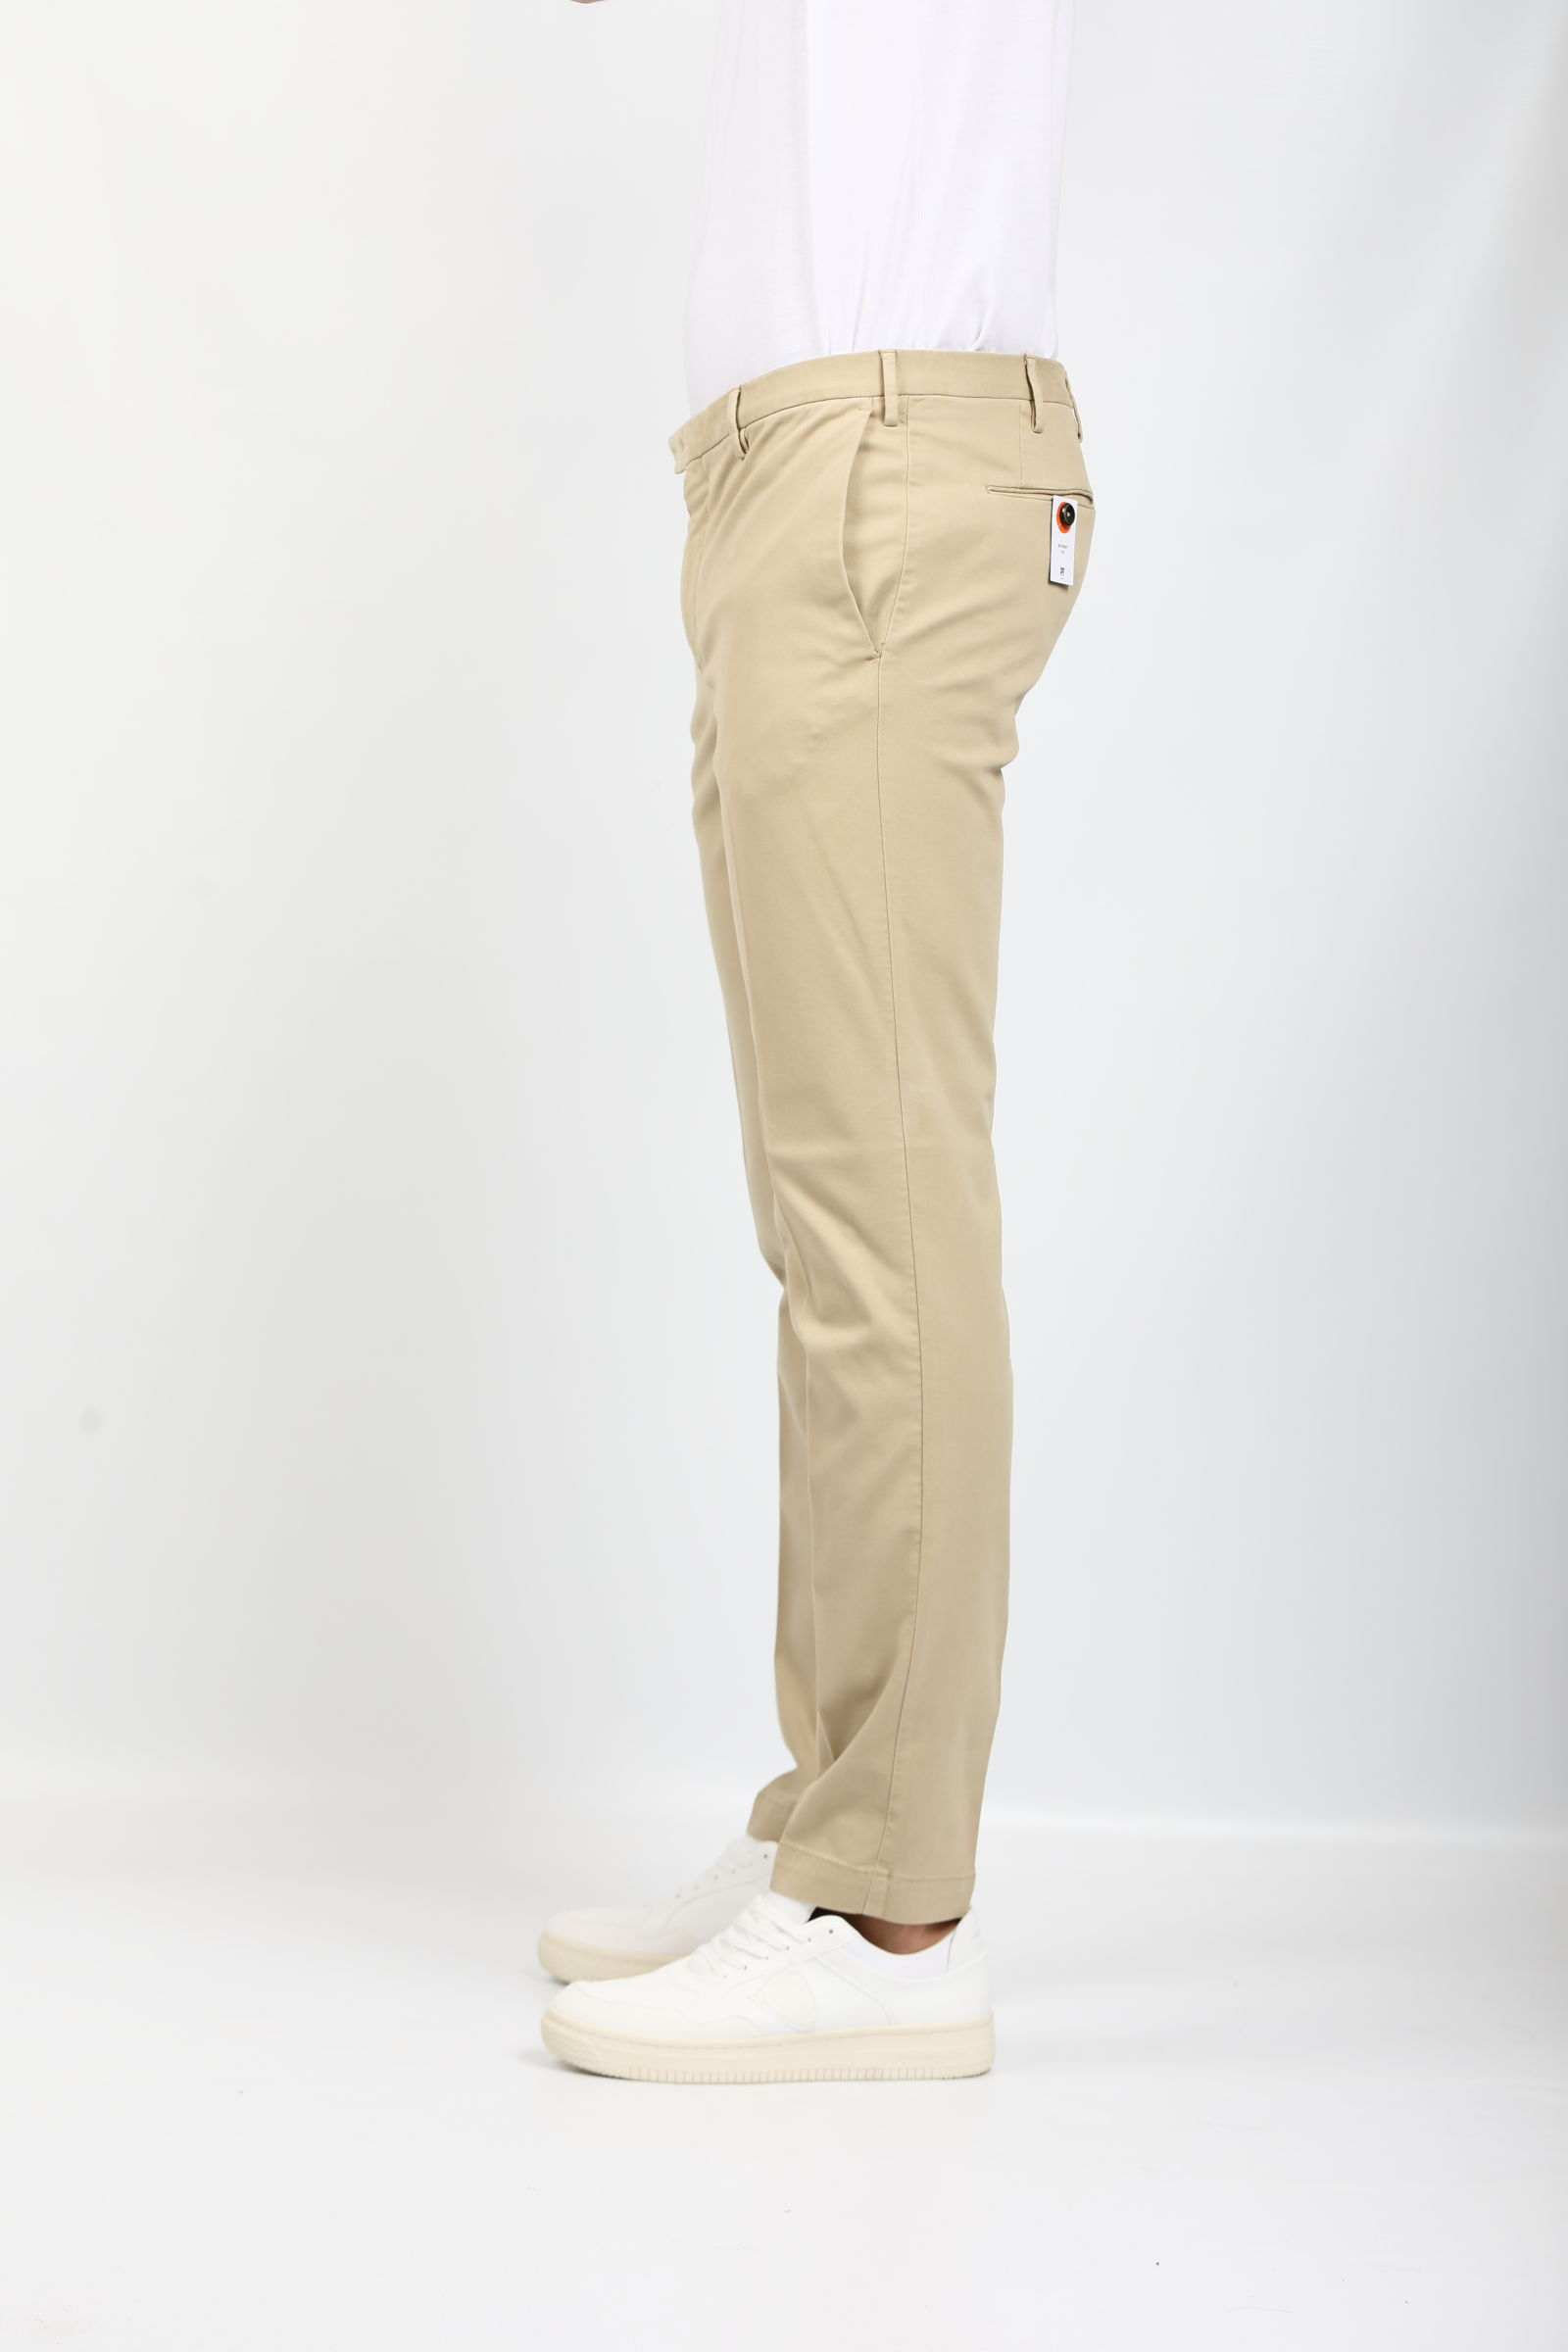 GABARDINE TROUSERS PT TORINO | Pants | KTZEZE00CL1-NU460060